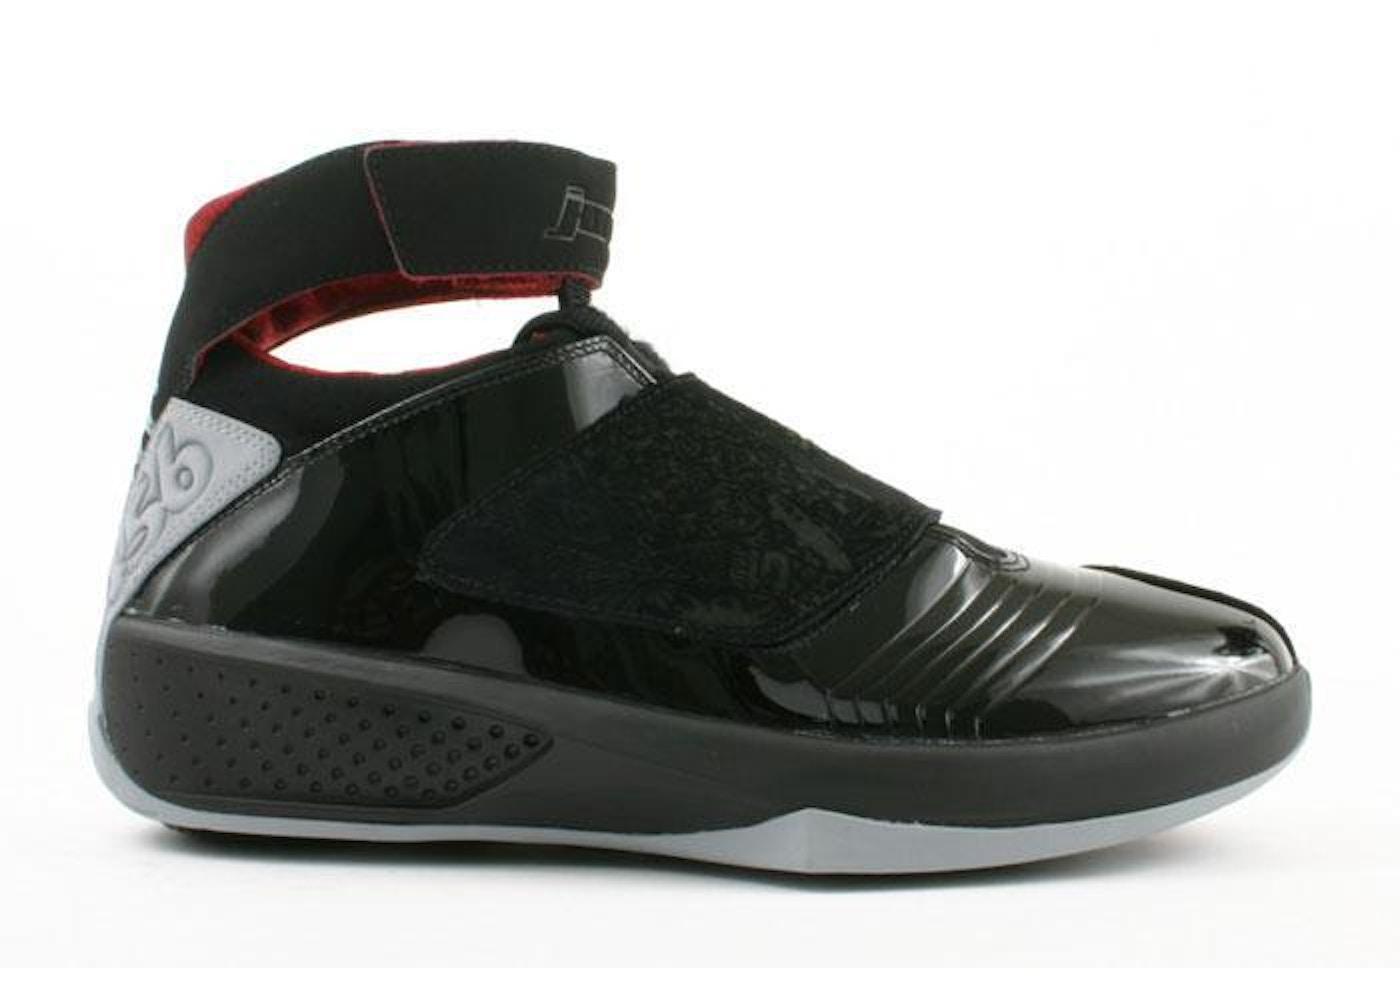 Air Jordan 20 Shoes - Average Sale Price 7ed626c5f5